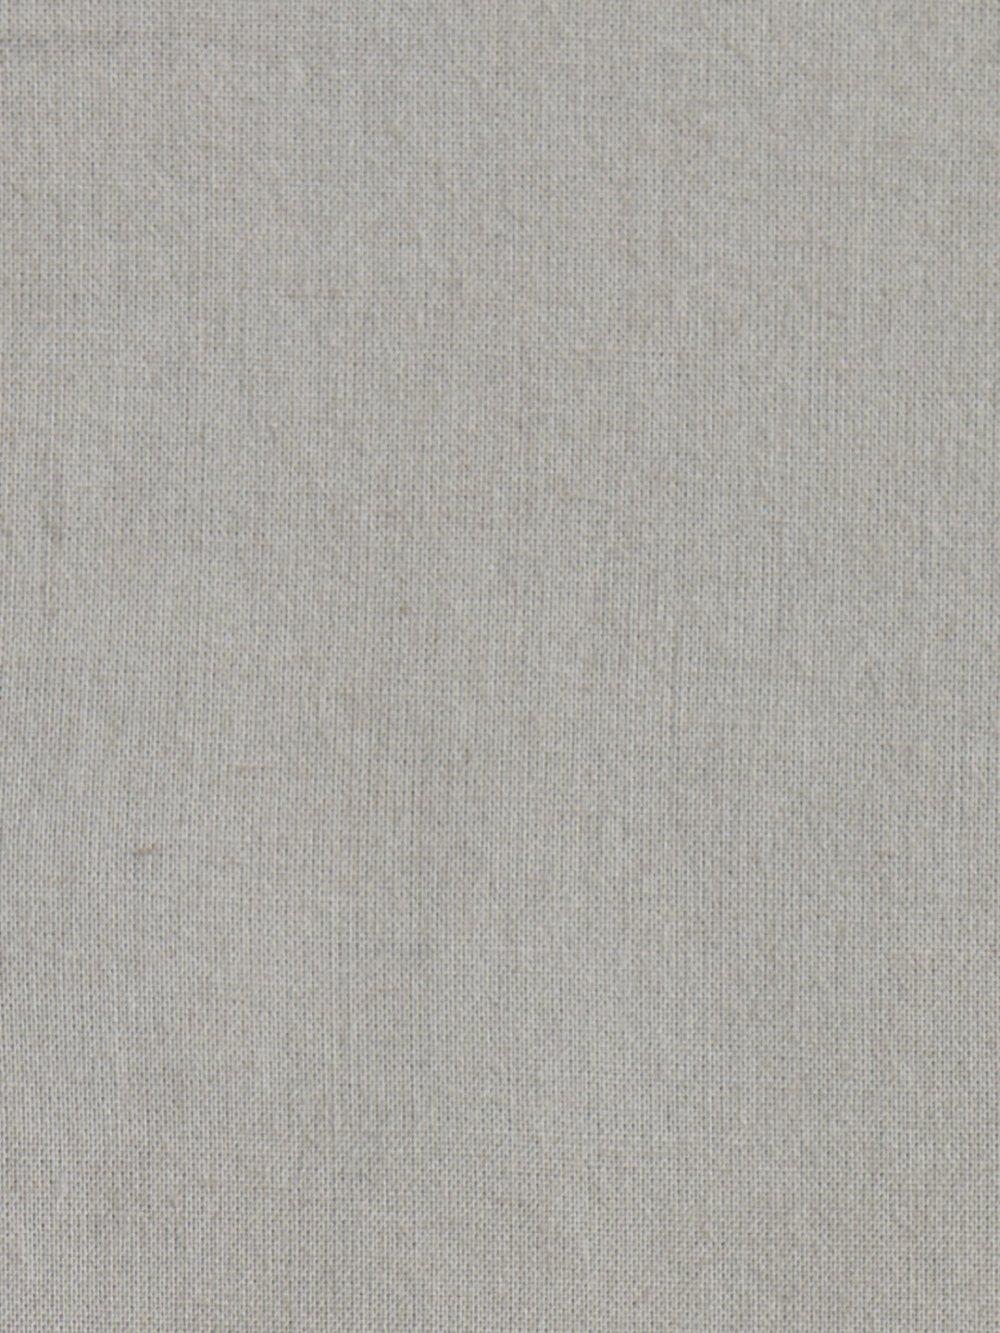 Organic Clothing Linen Texture